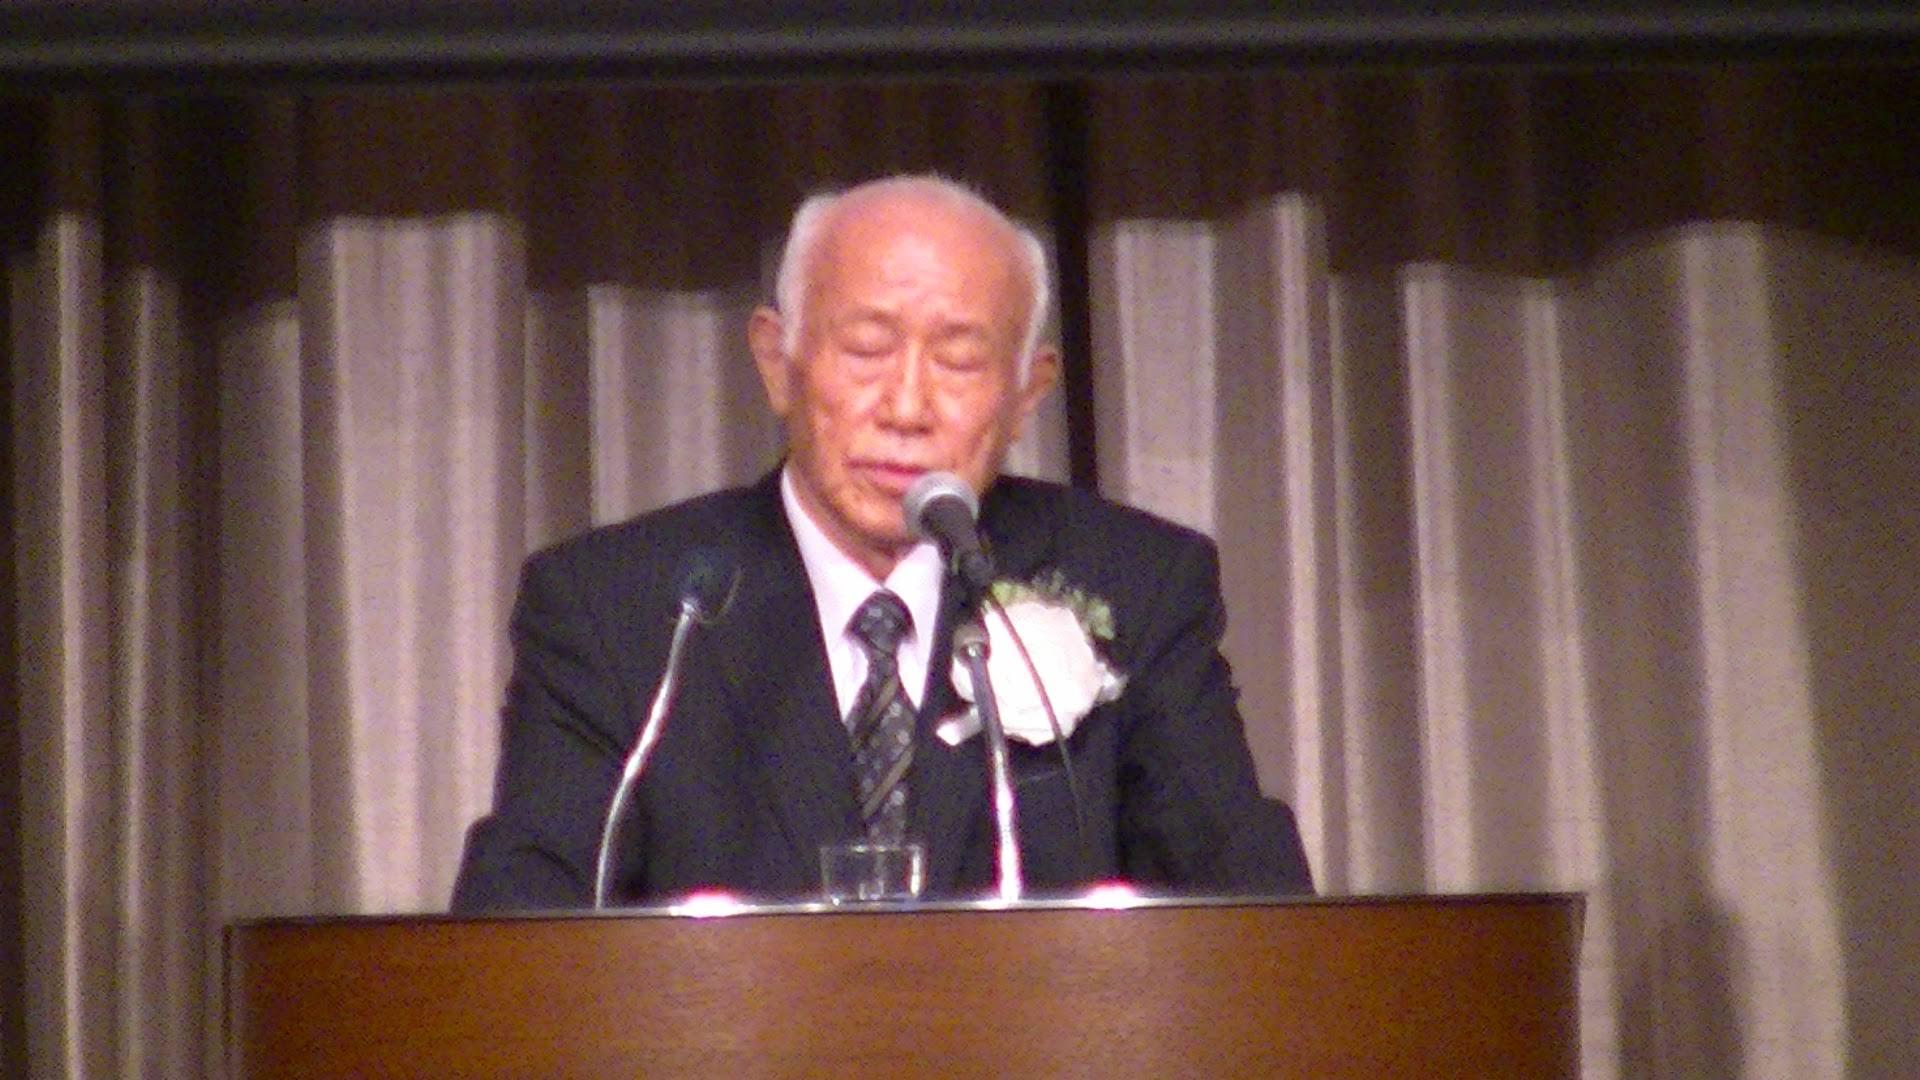 PIC 1678 1 - 思風会全国大会in広島